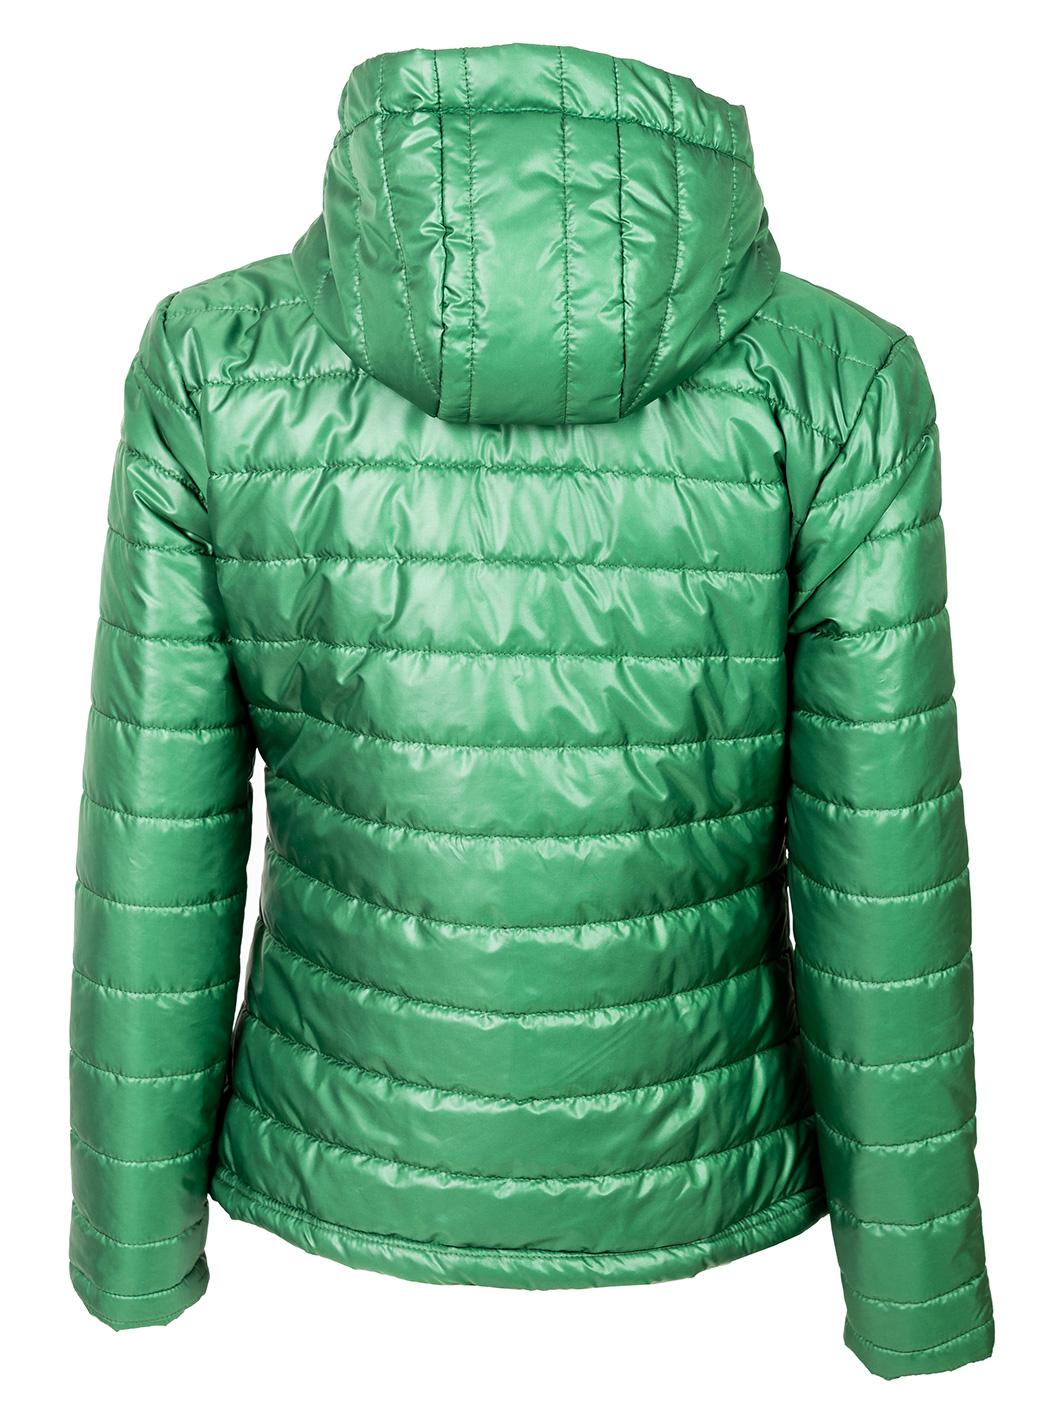 ženska jakna zelena